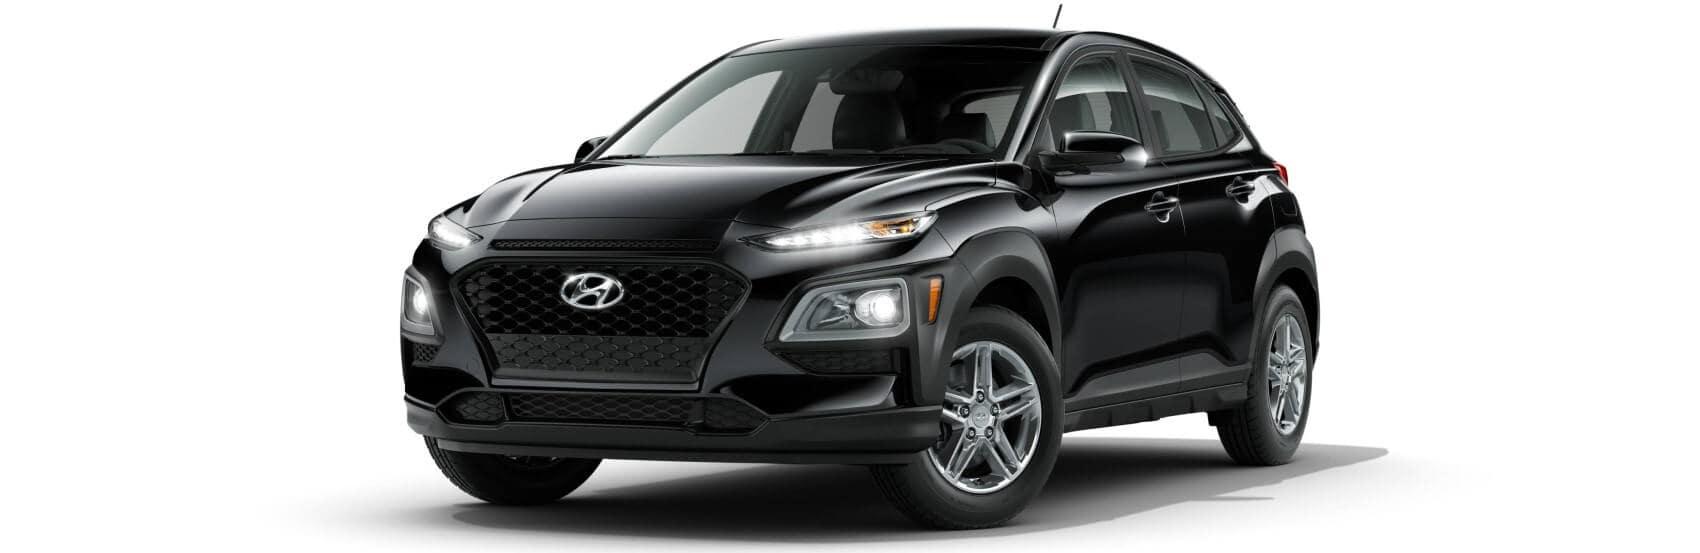 Hyundai Kona Accessories Littleton CO  McDonald Hyundai